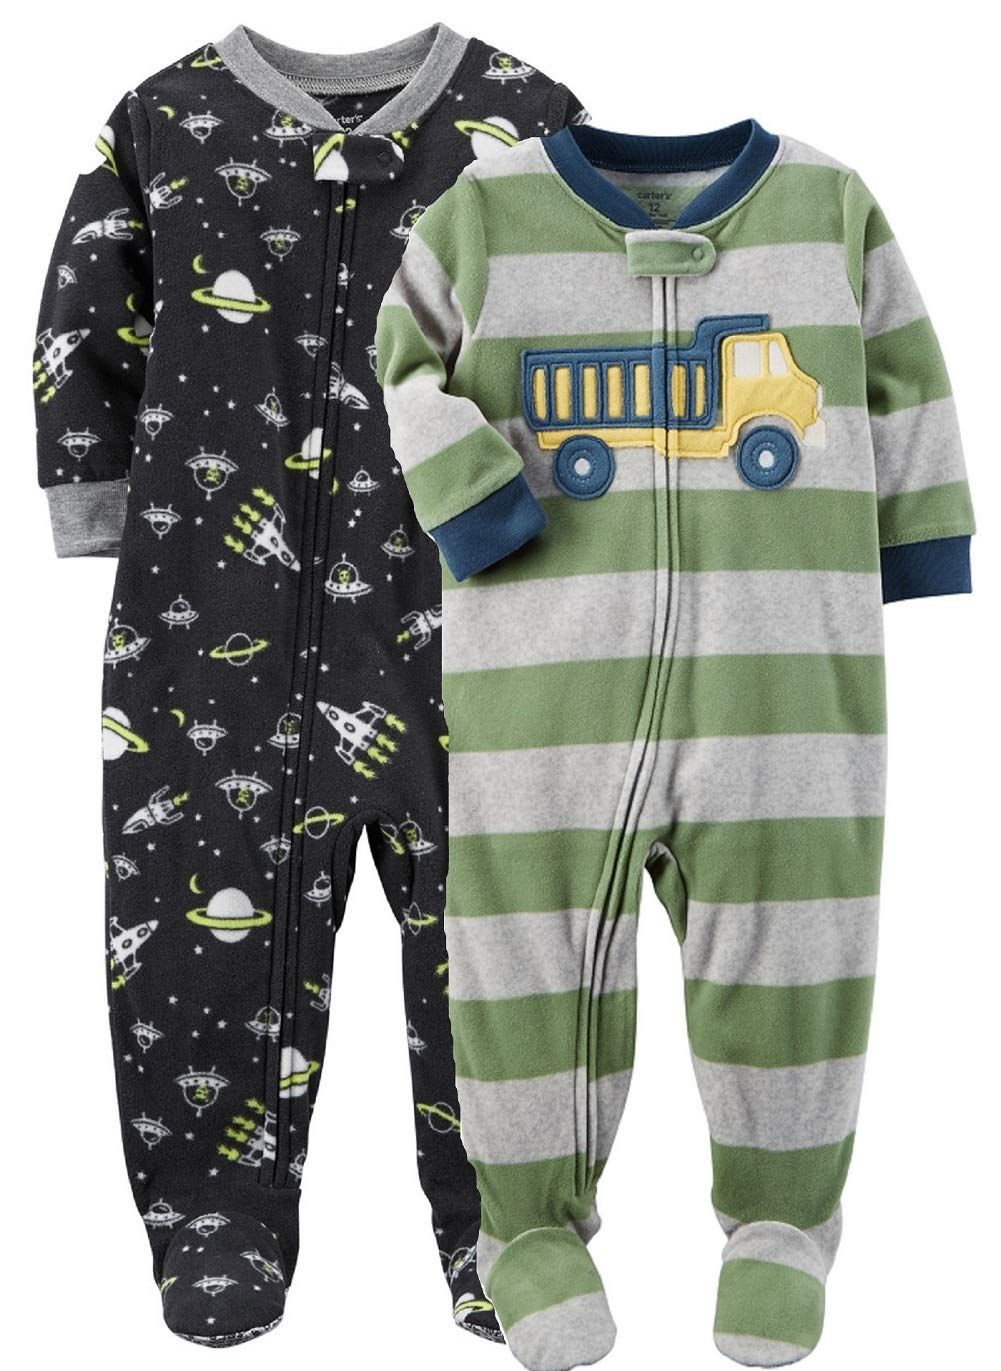 27a462458b0f Carters Baby Boys 2 Pack Fleece Pajamas Black Space Green Grey 12 ...